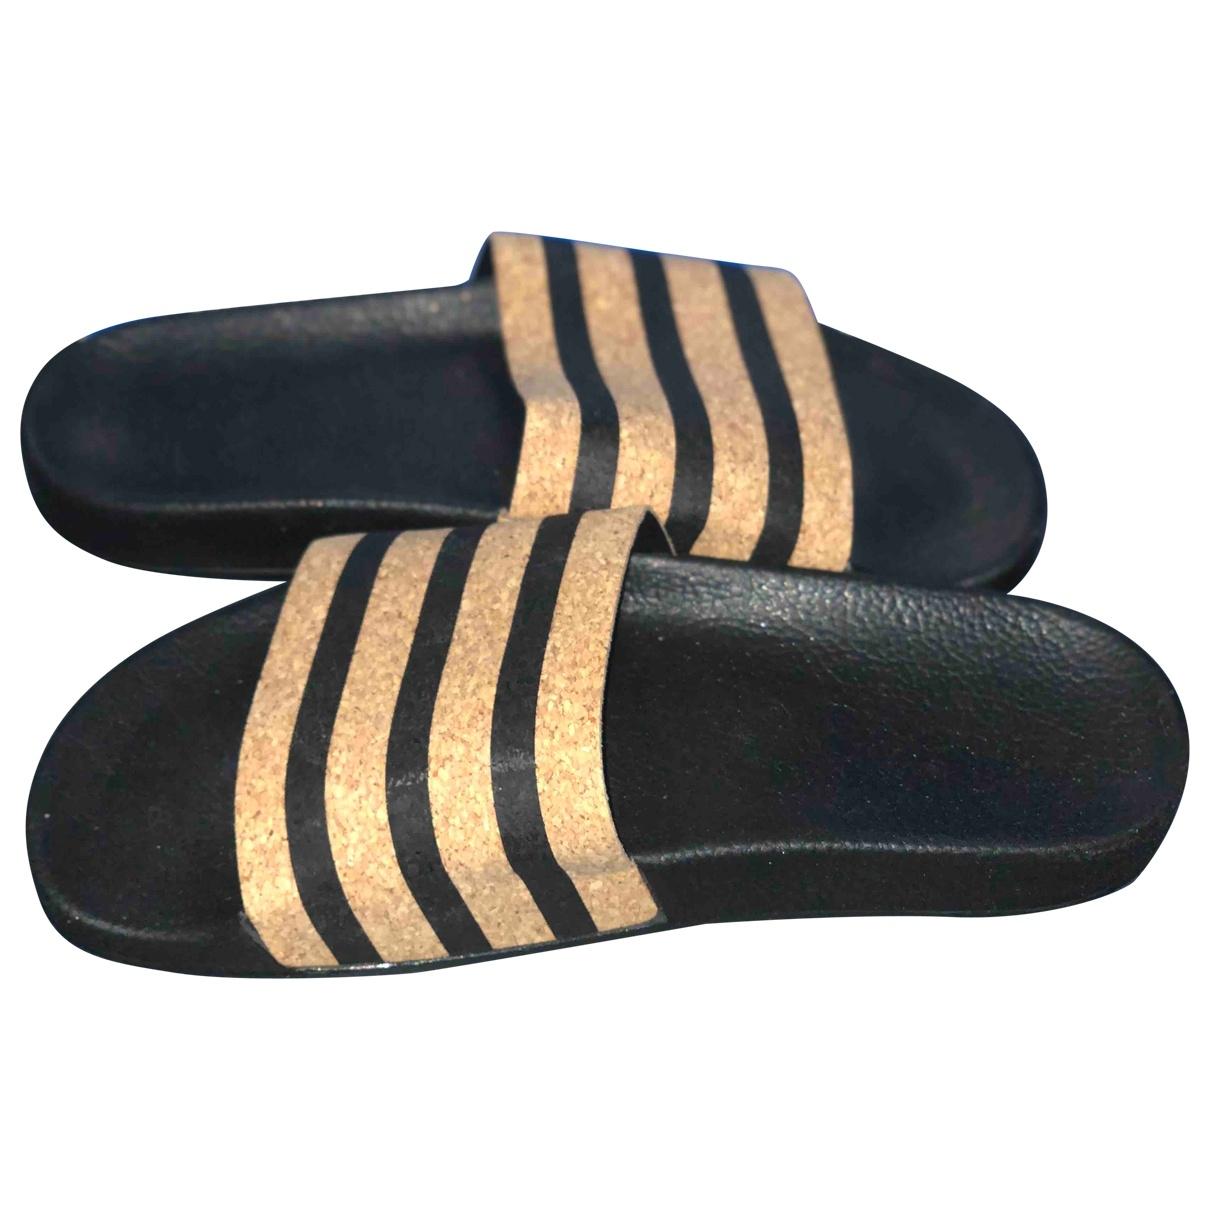 Adidas Adilette  Black Leather Sandals for Women 39 EU